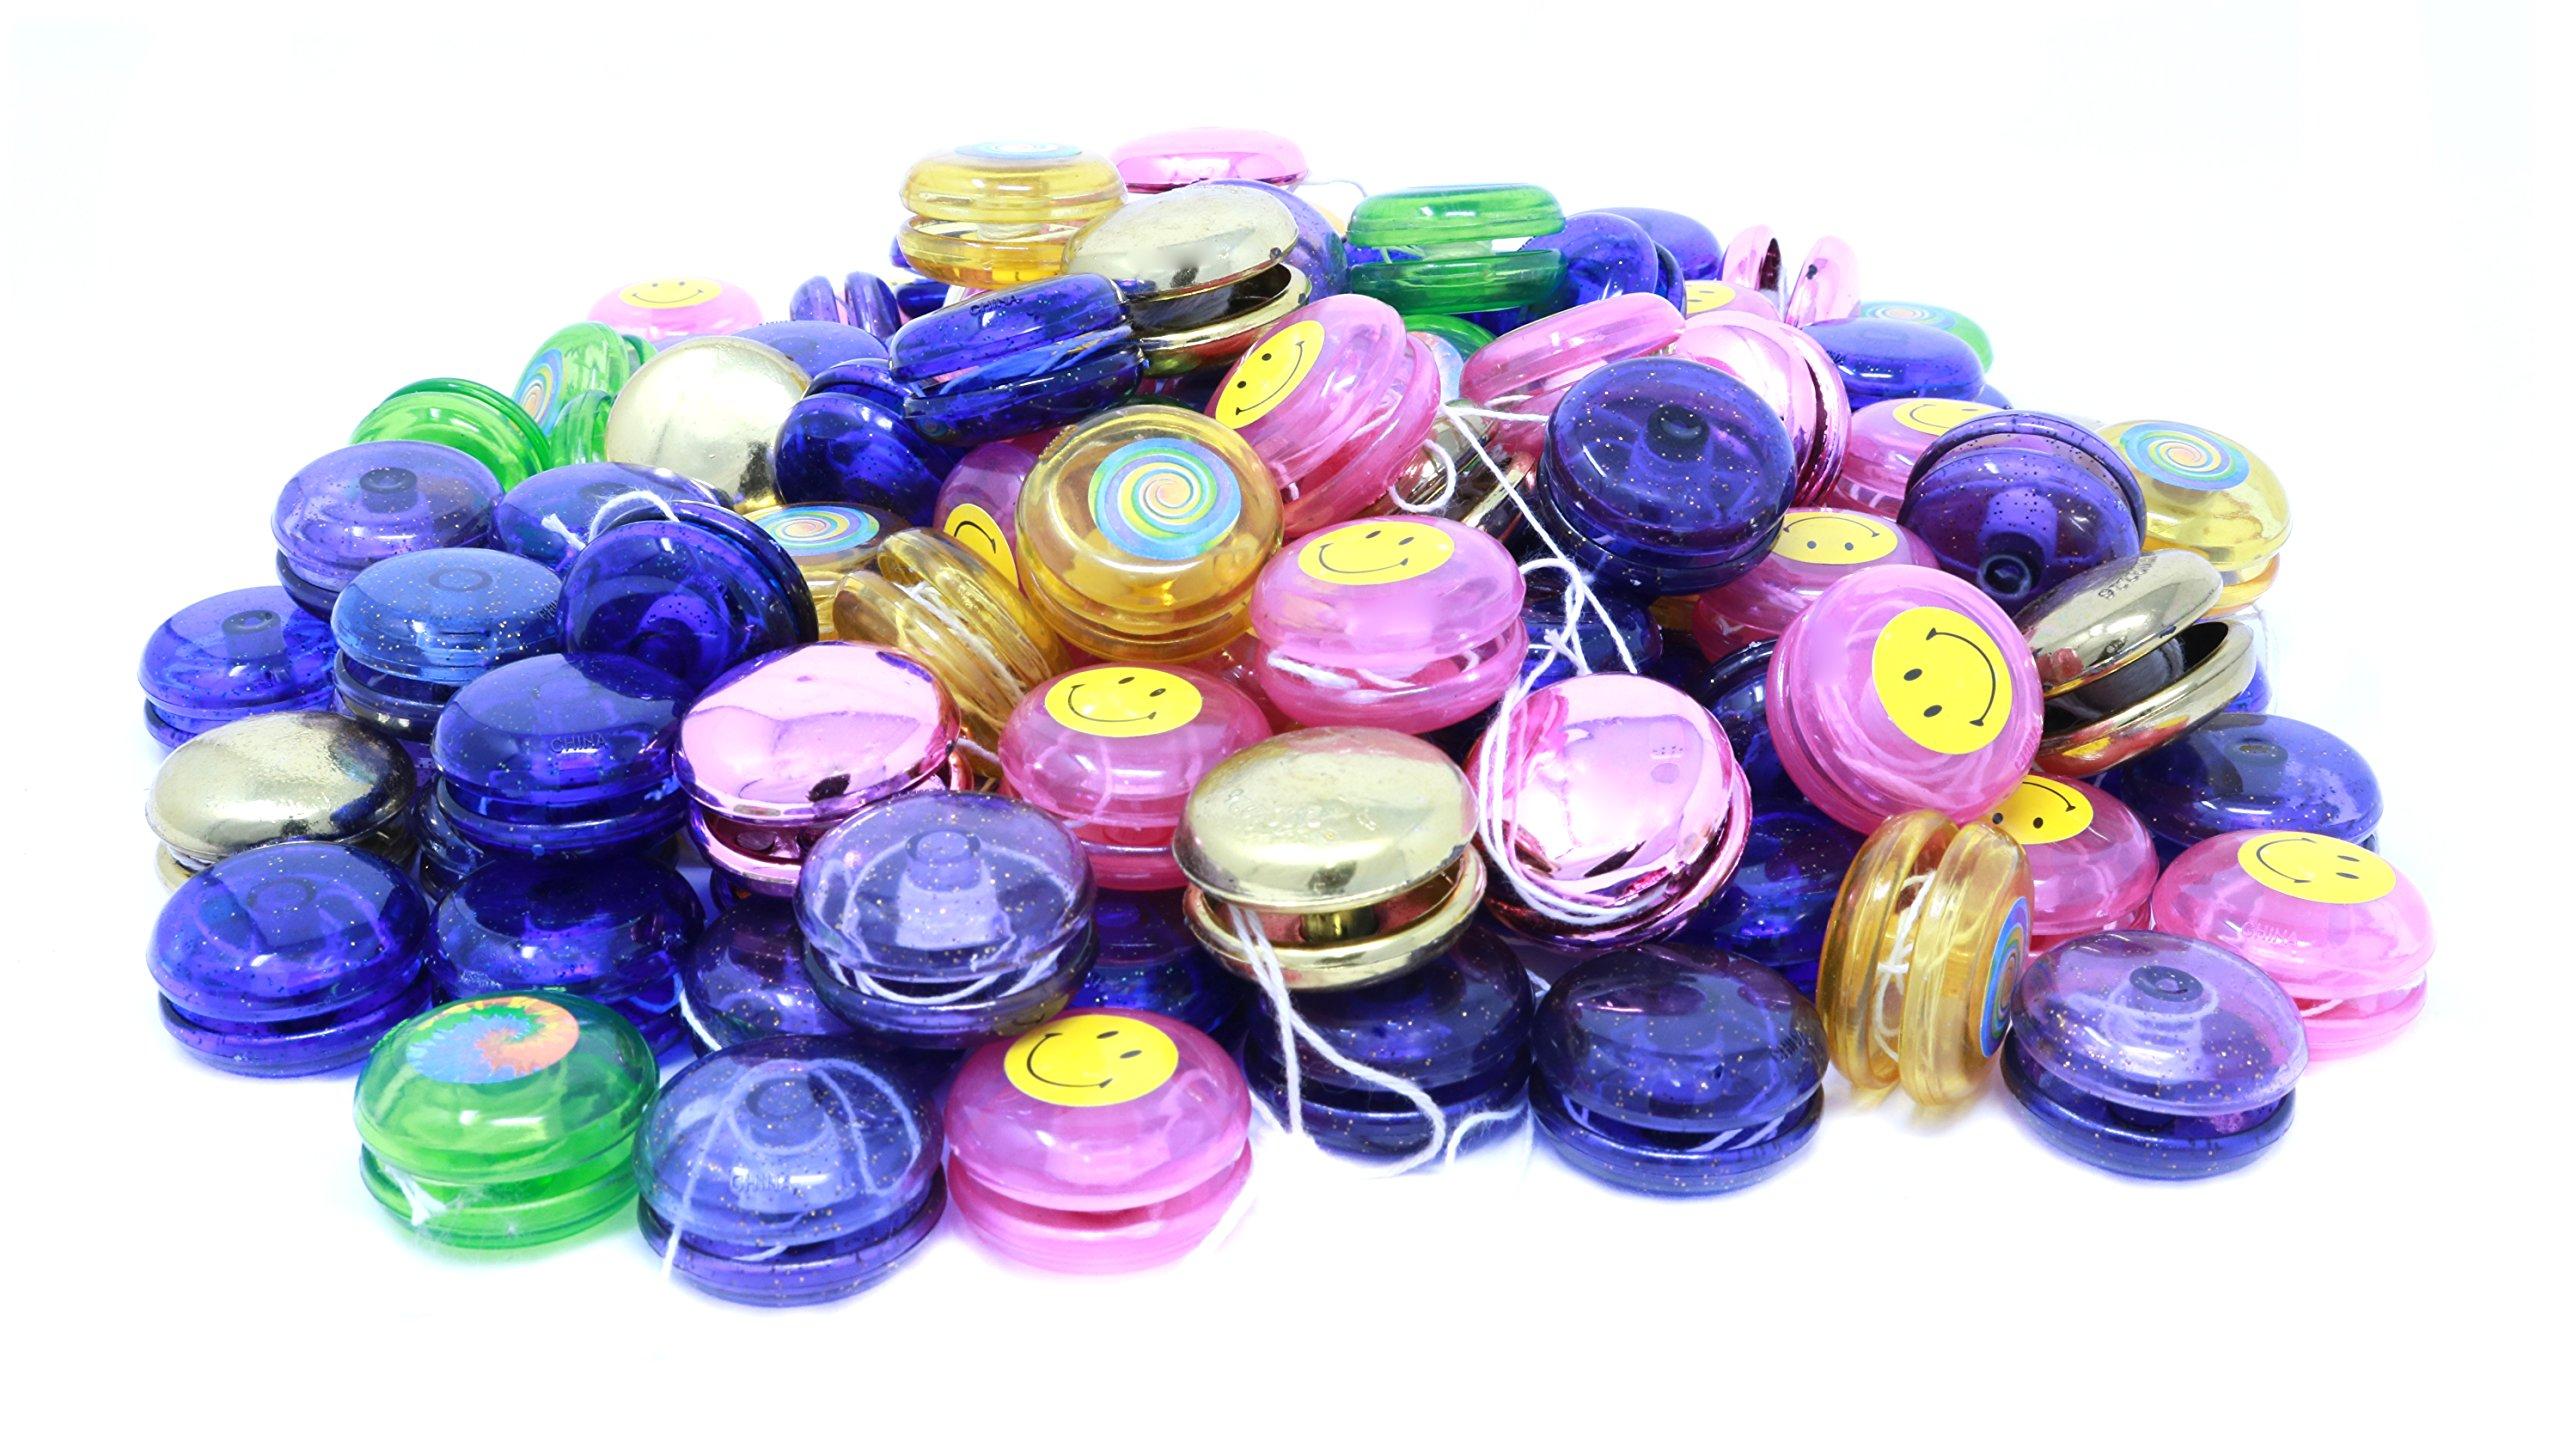 Mini Yoyo Assortment - Bulk Pack Of 144 Yo Yos In Bright Colors And Styles